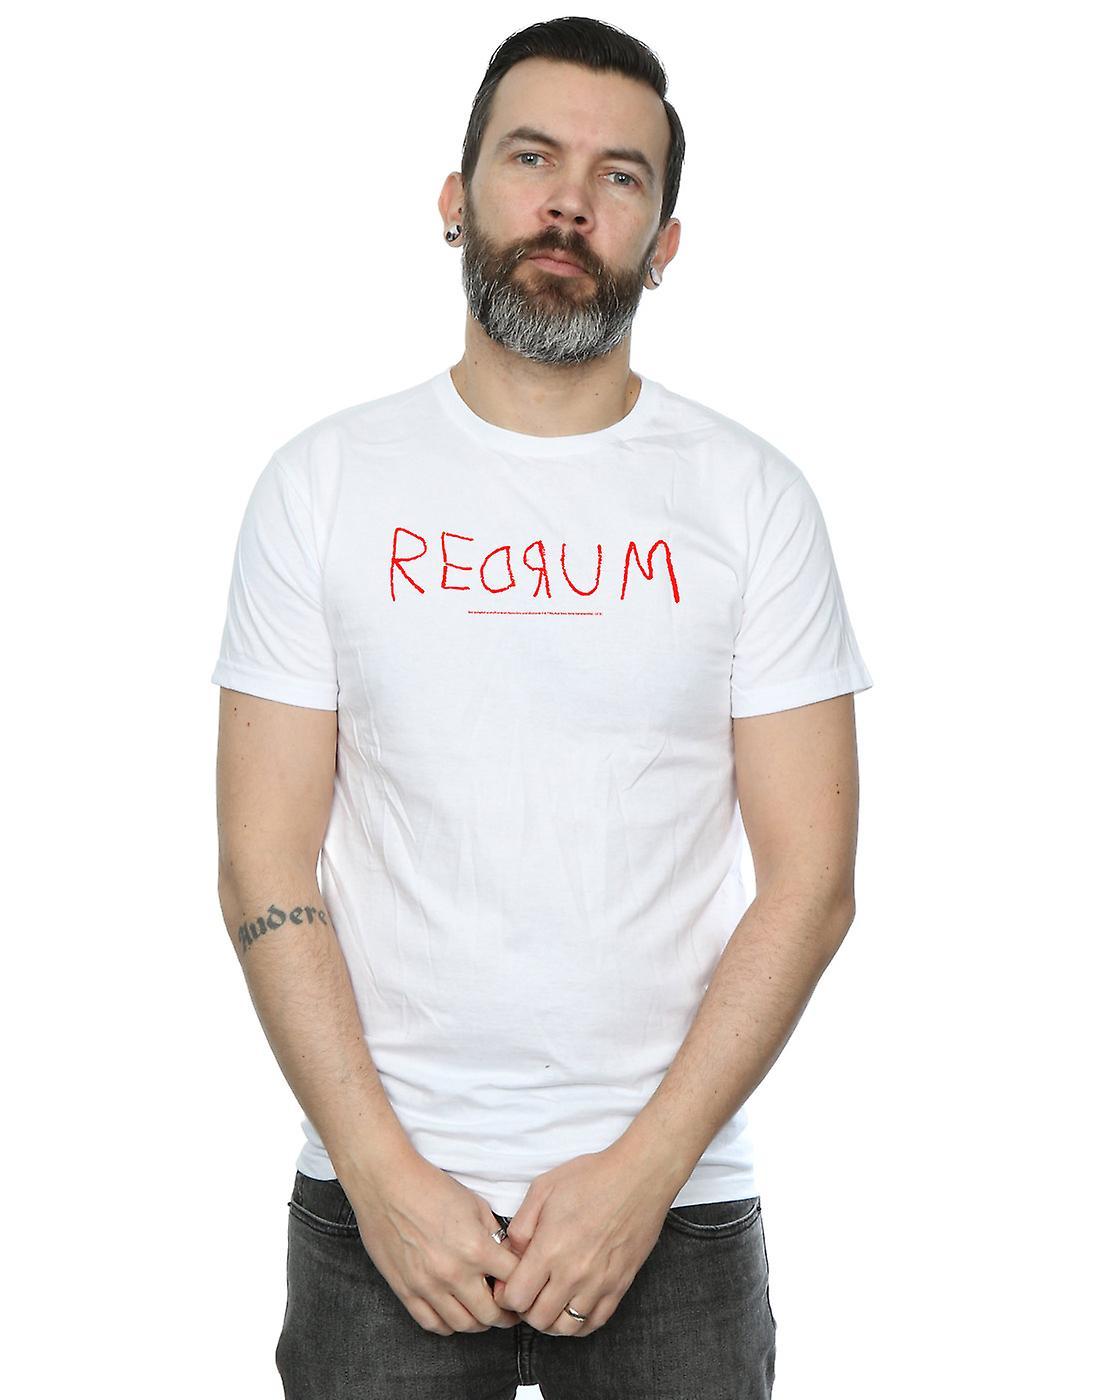 The Shining Men's Redrum Text T-Shirt